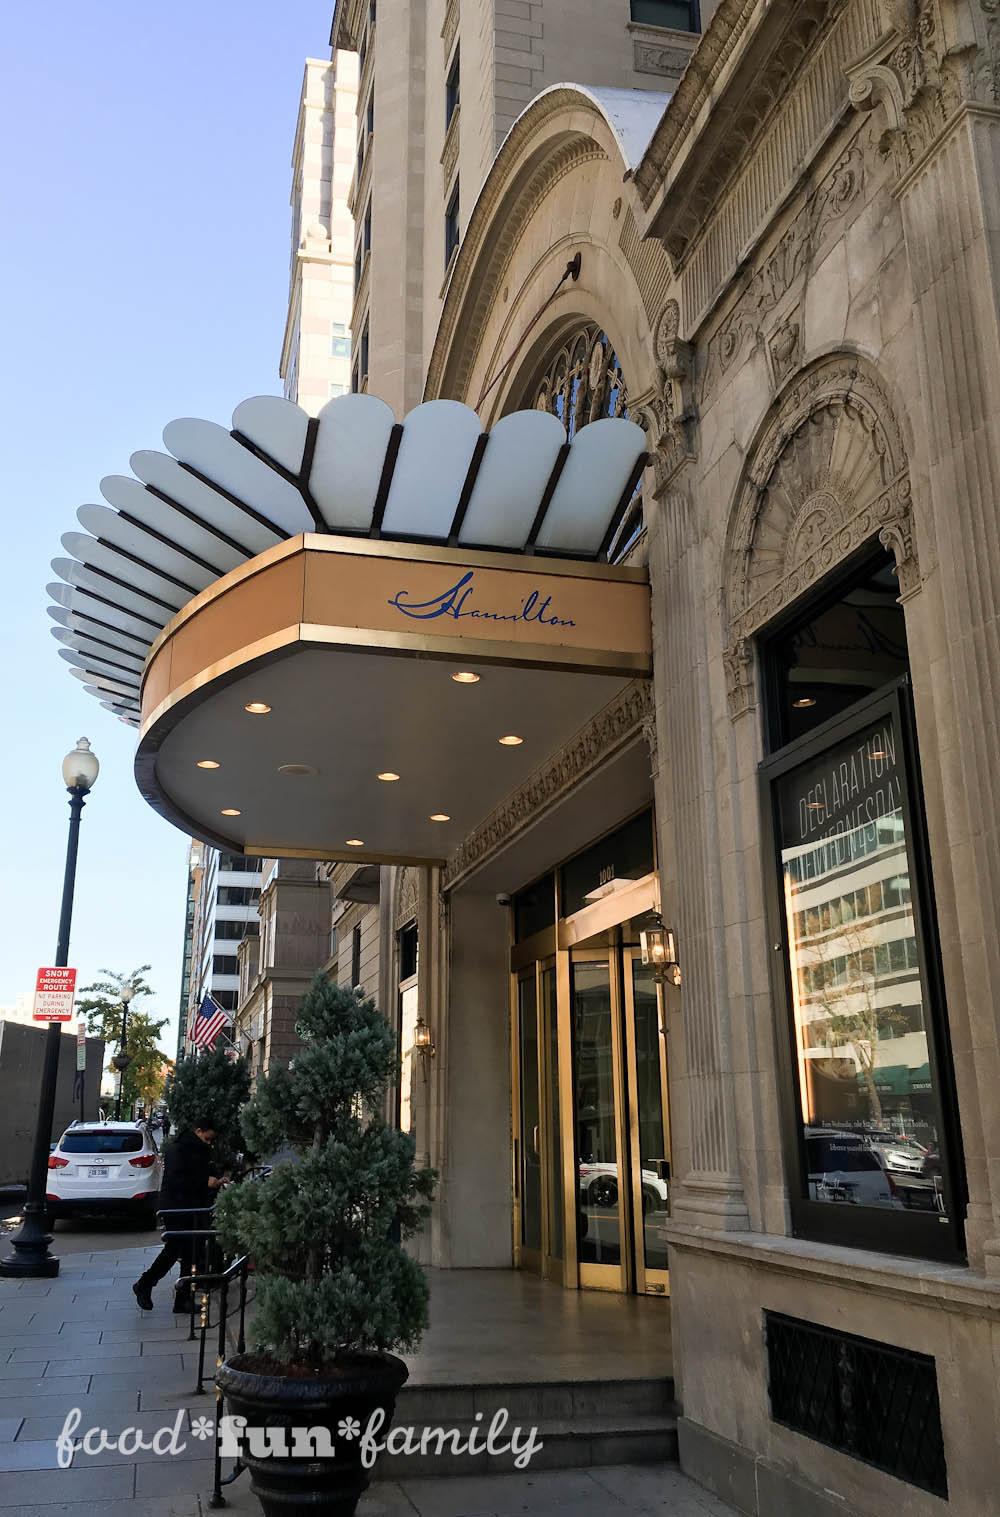 Hamilton Crowne Plaza Washington DC Hotel at Food Fun Family